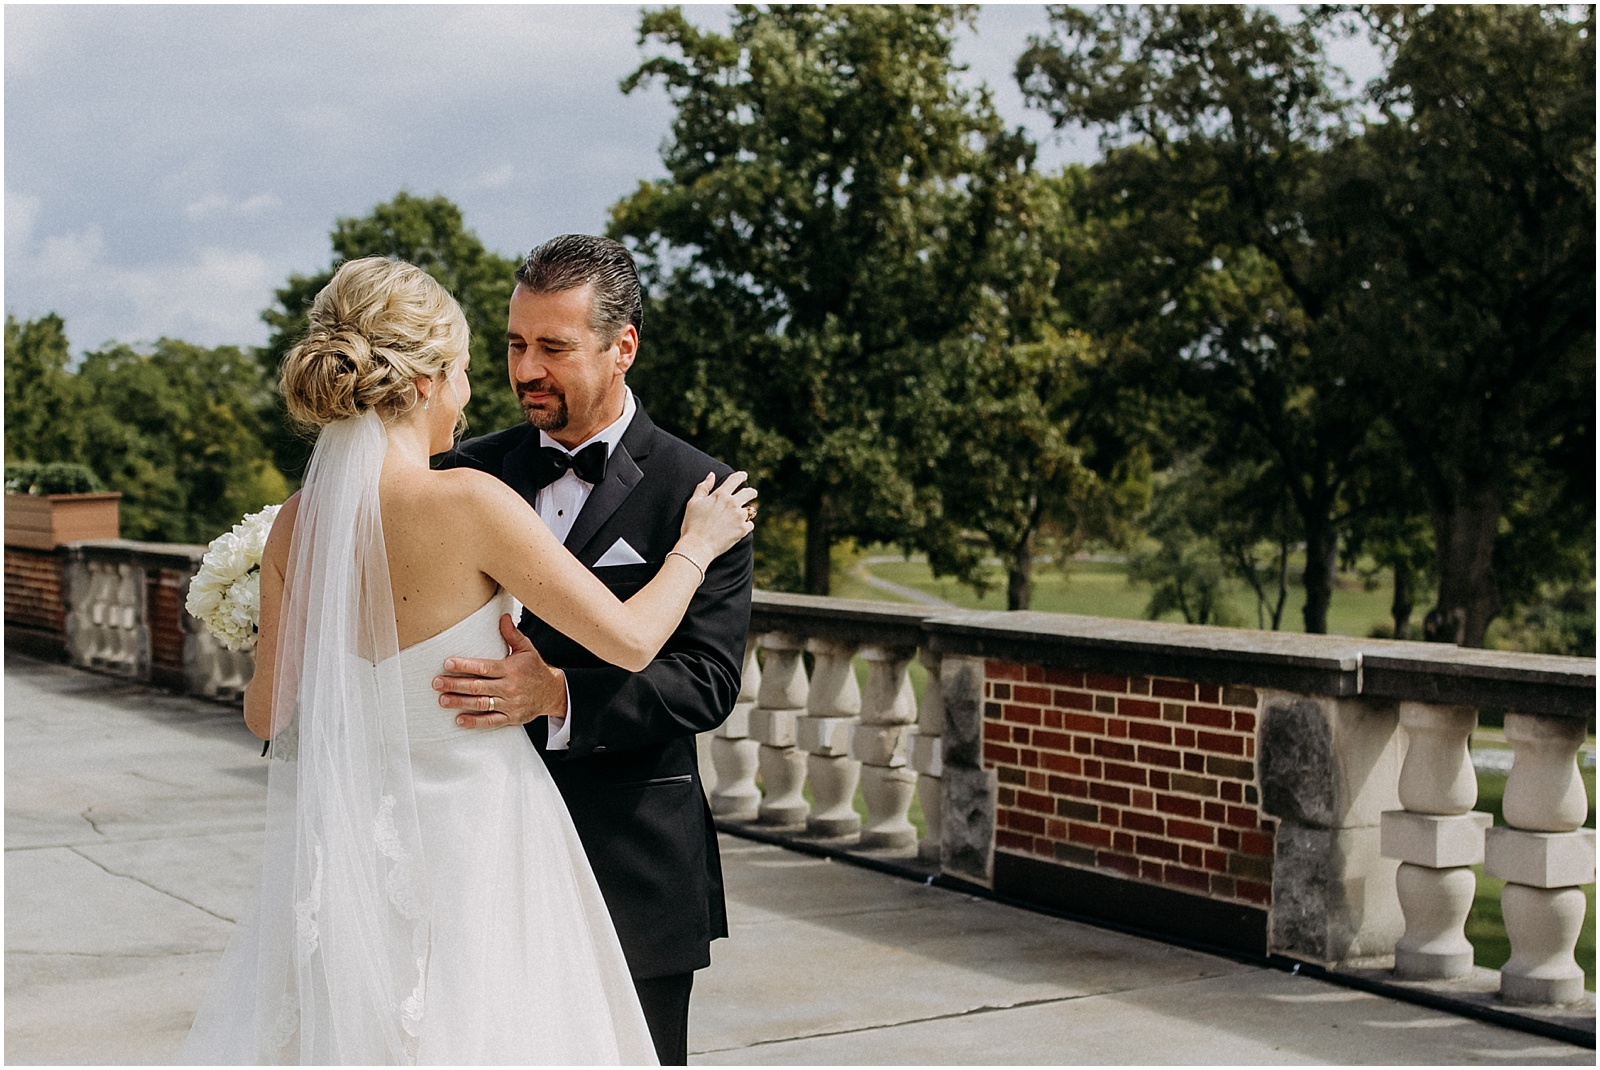 glen_echo_st_louis_mo_wedding_0042.jpg